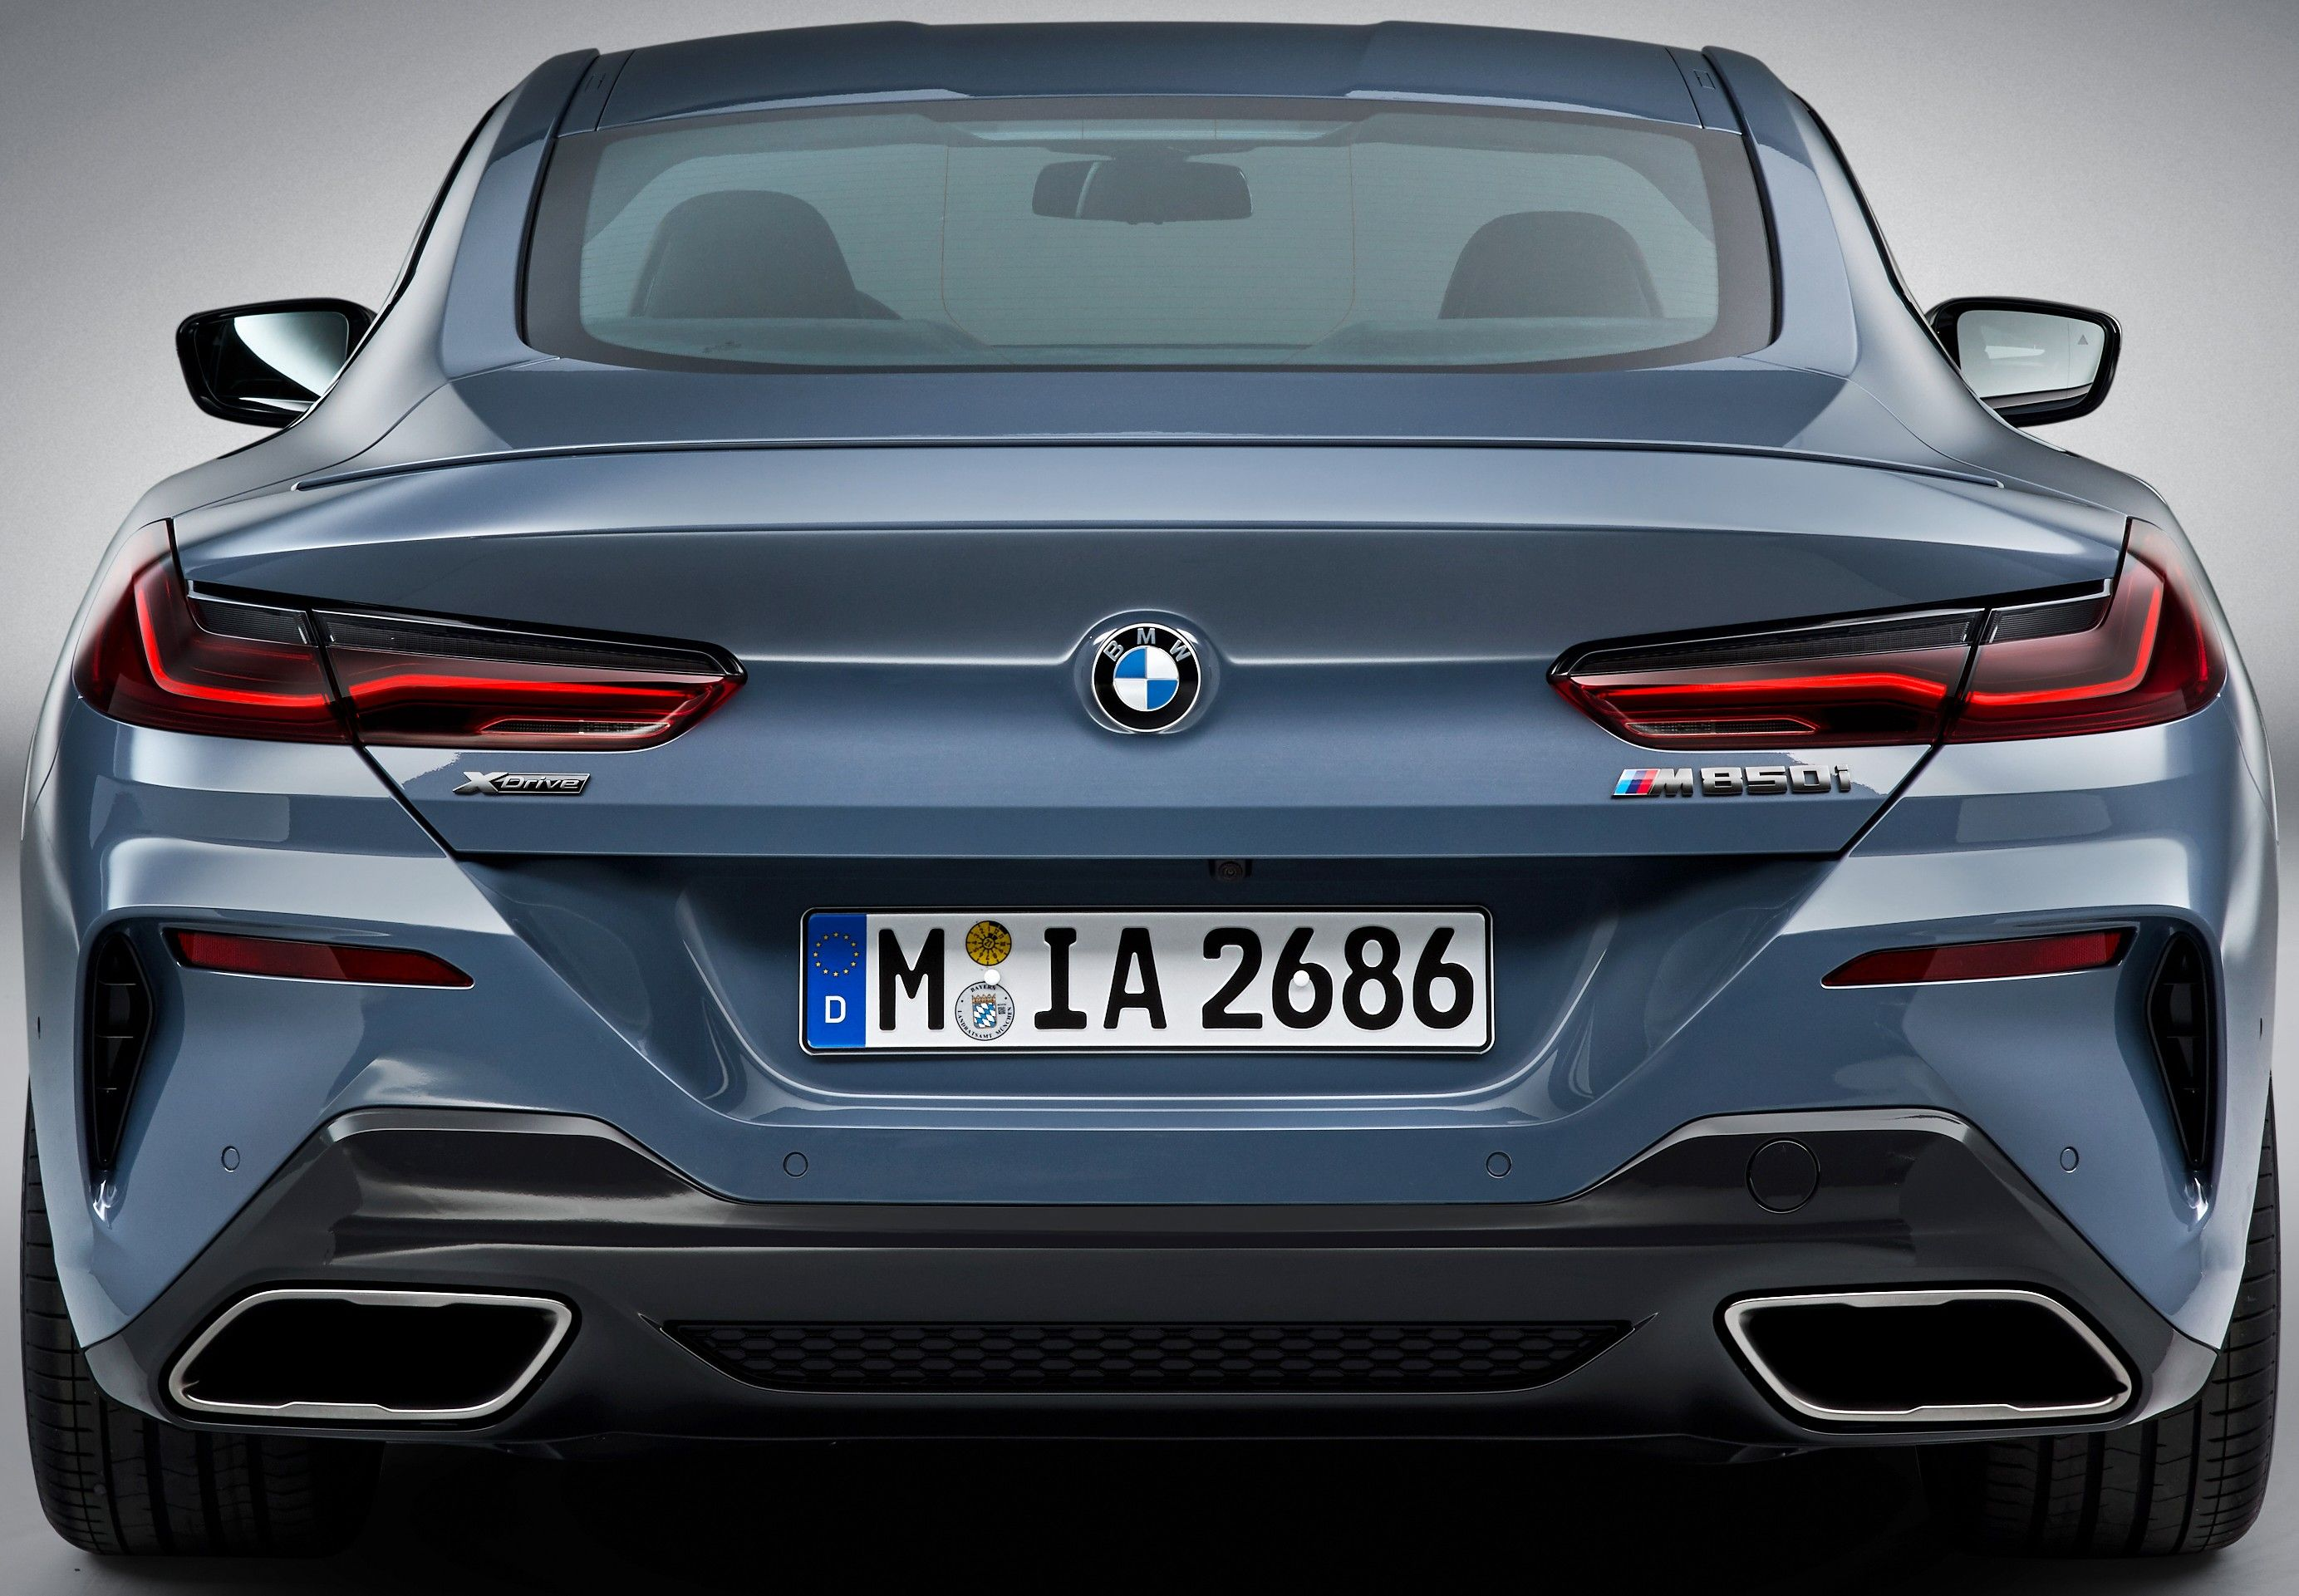 Bmw M850 I Coupe 2018 Smcars Net Car Blueprints Forum Bmw Bmw I Europe Car